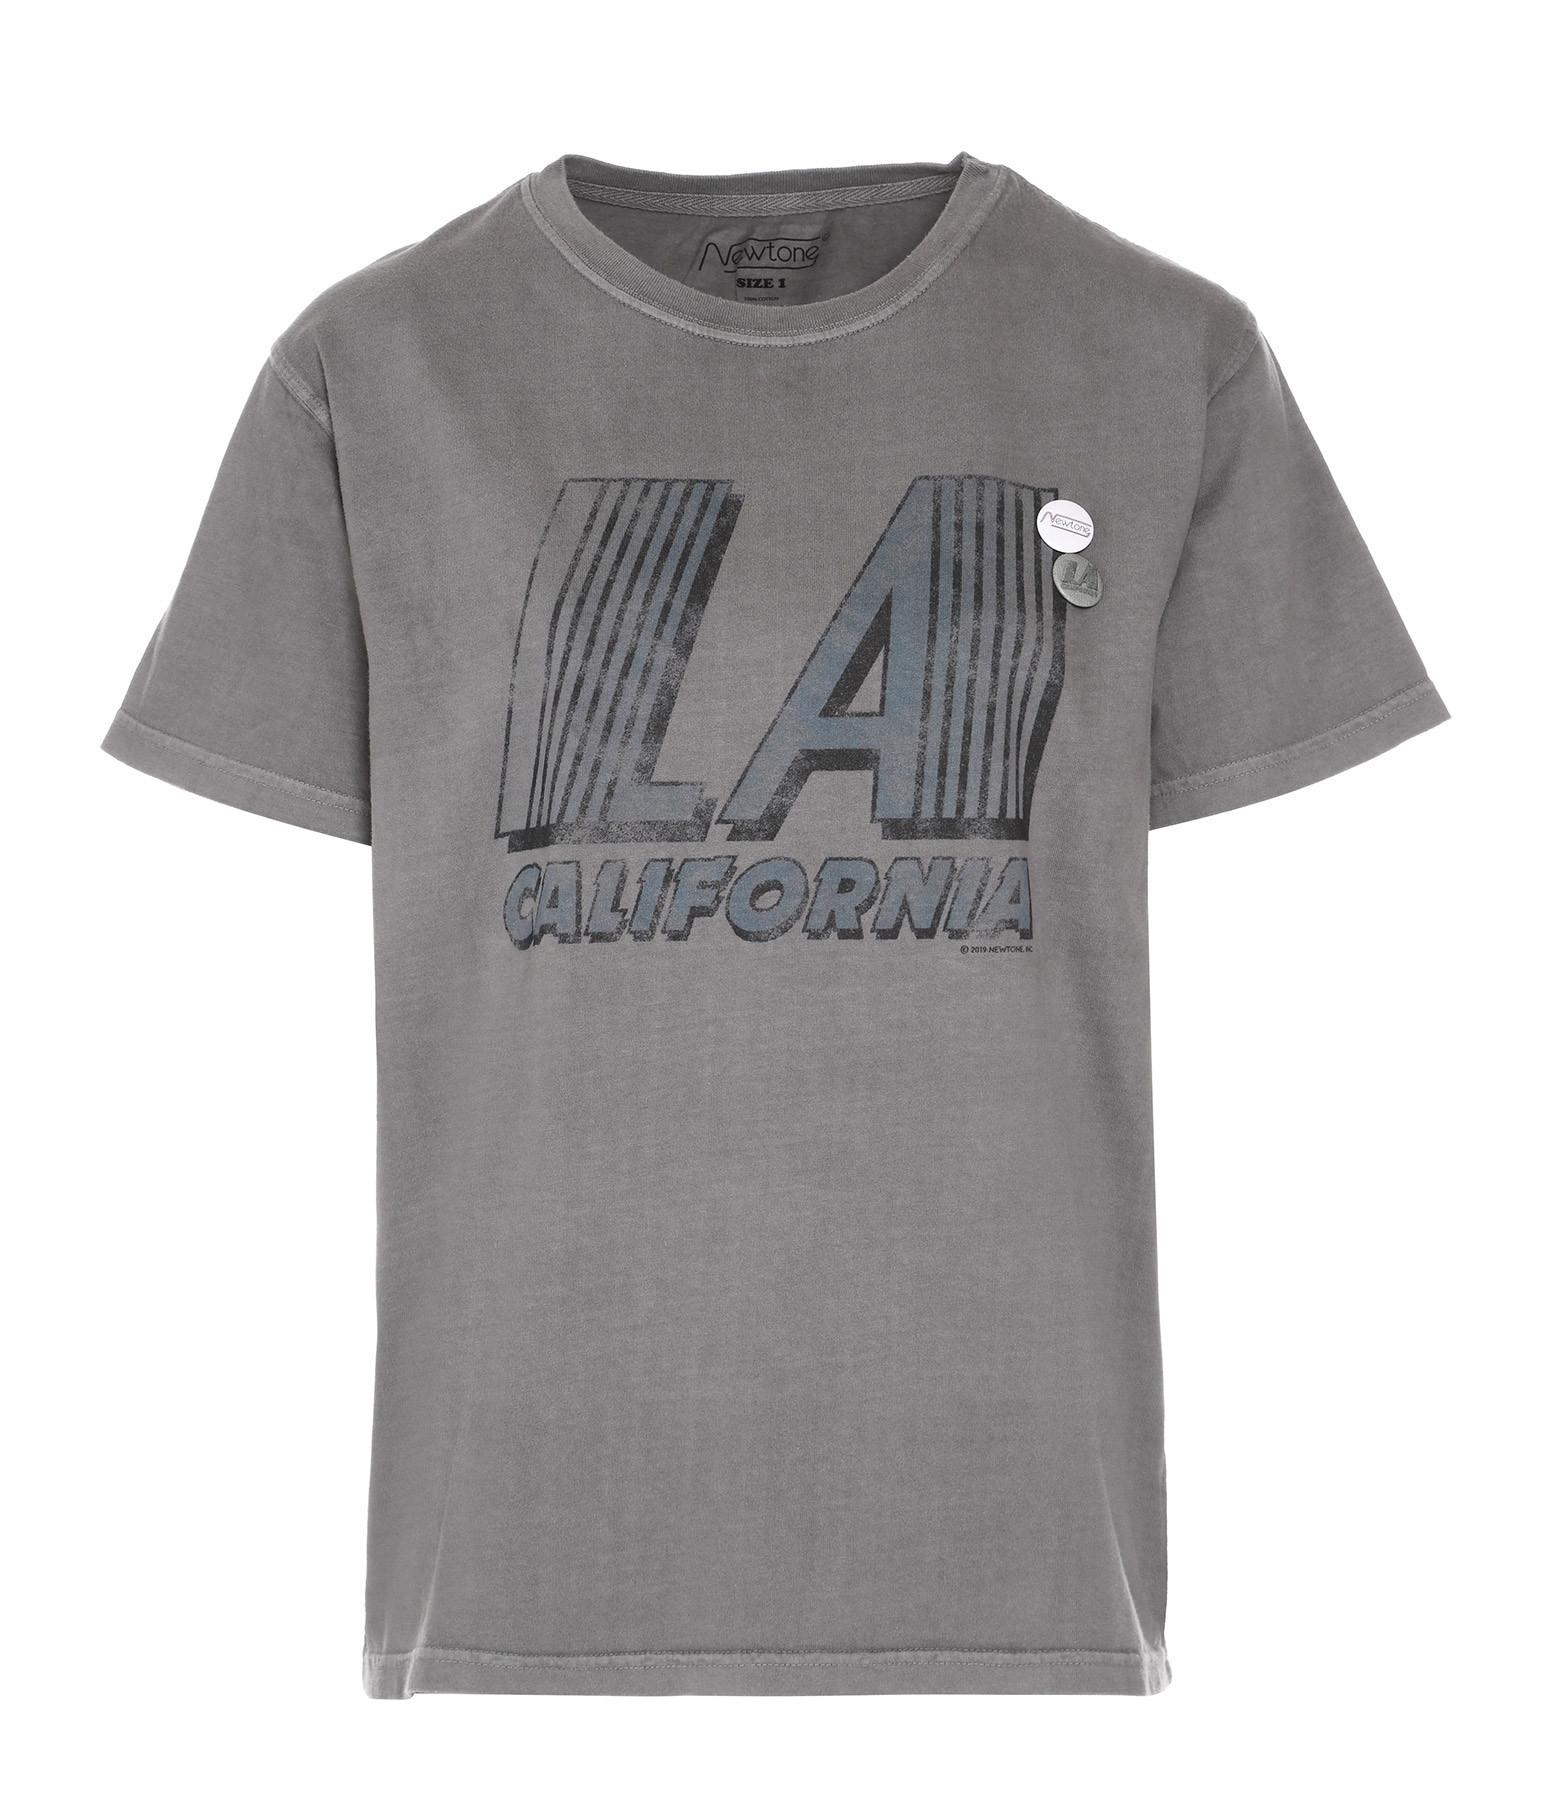 NEWTONE - Tee-shirt L.A Coton Gris